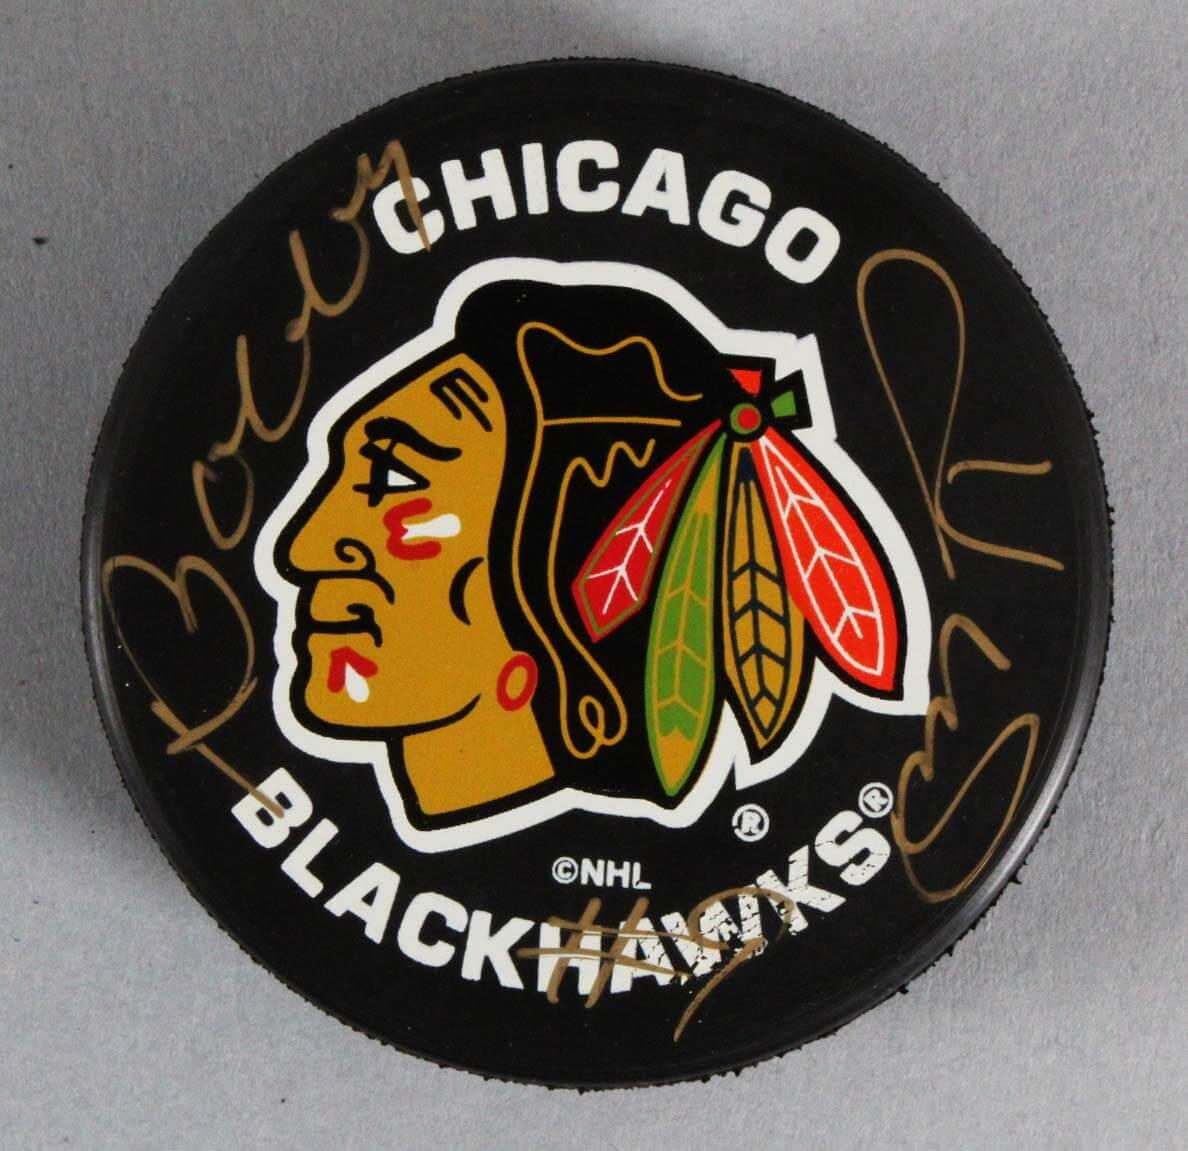 Hockey-nhl Coa Bobby Hull Autographed Chicago Blackhawks Hockey Puck